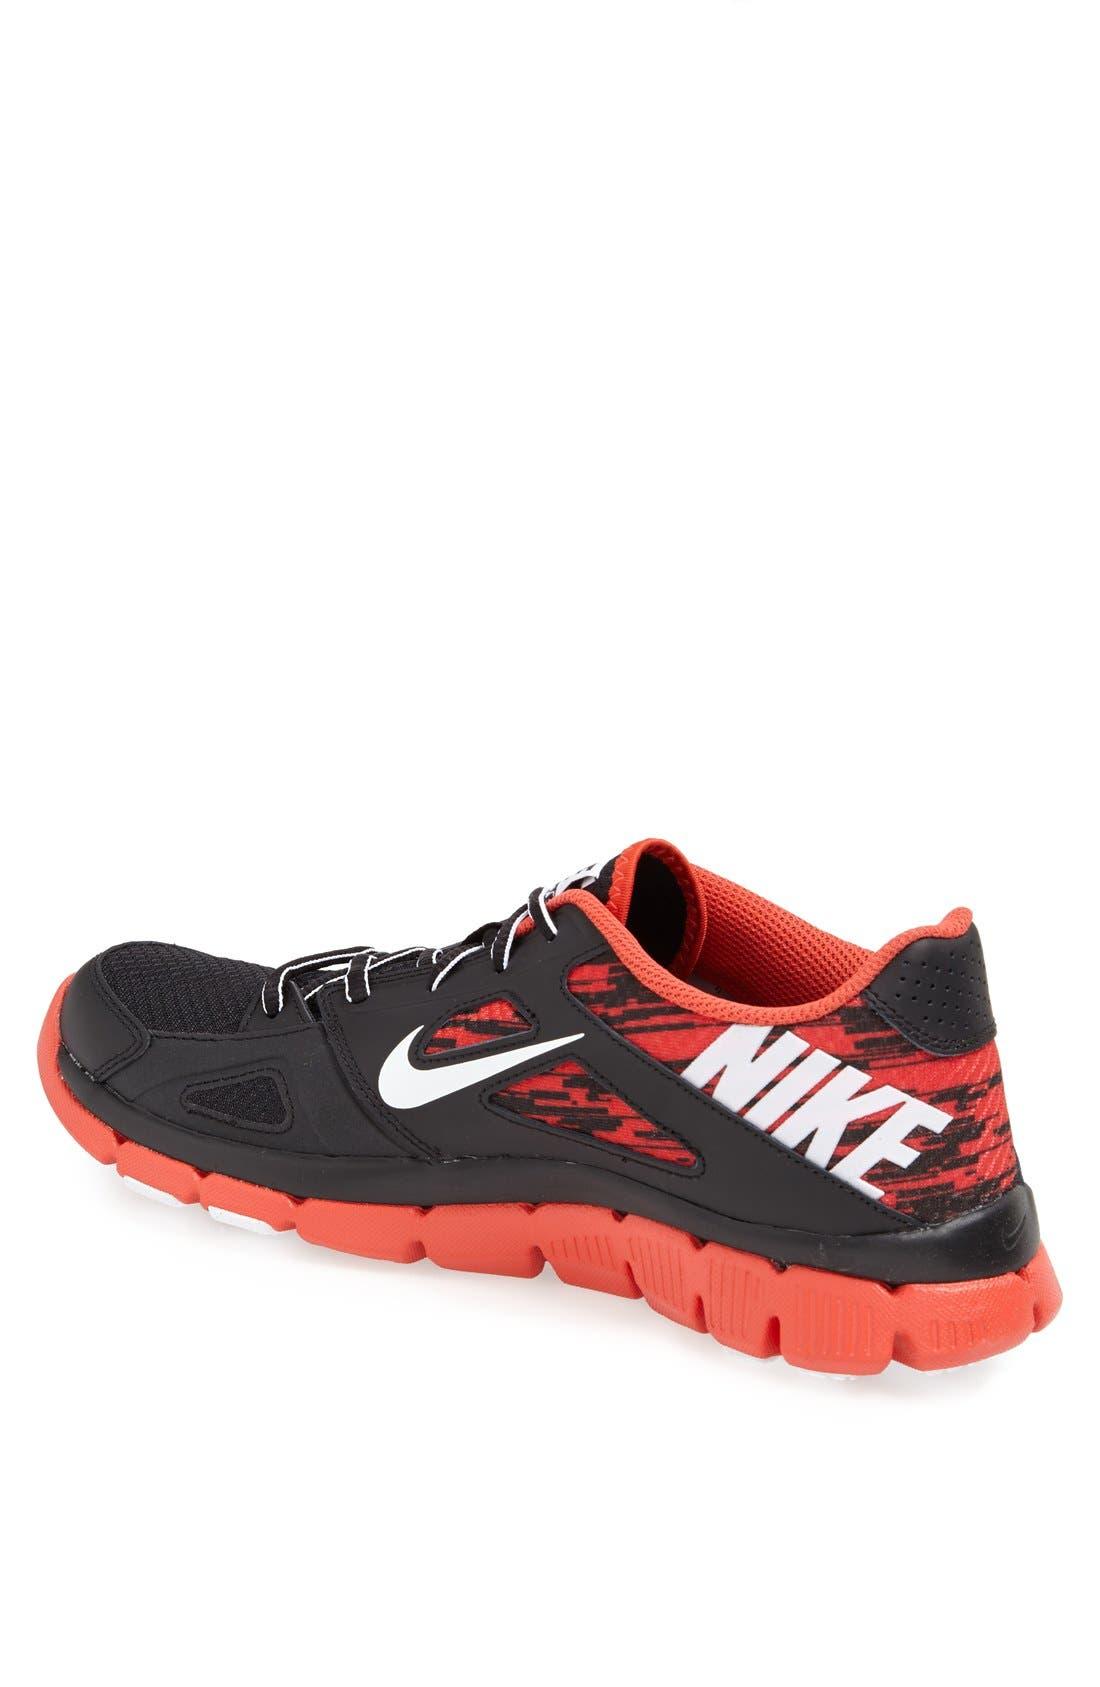 Alternate Image 2  - Nike 'Flex Supreme TR 2' Training Shoe (Men)